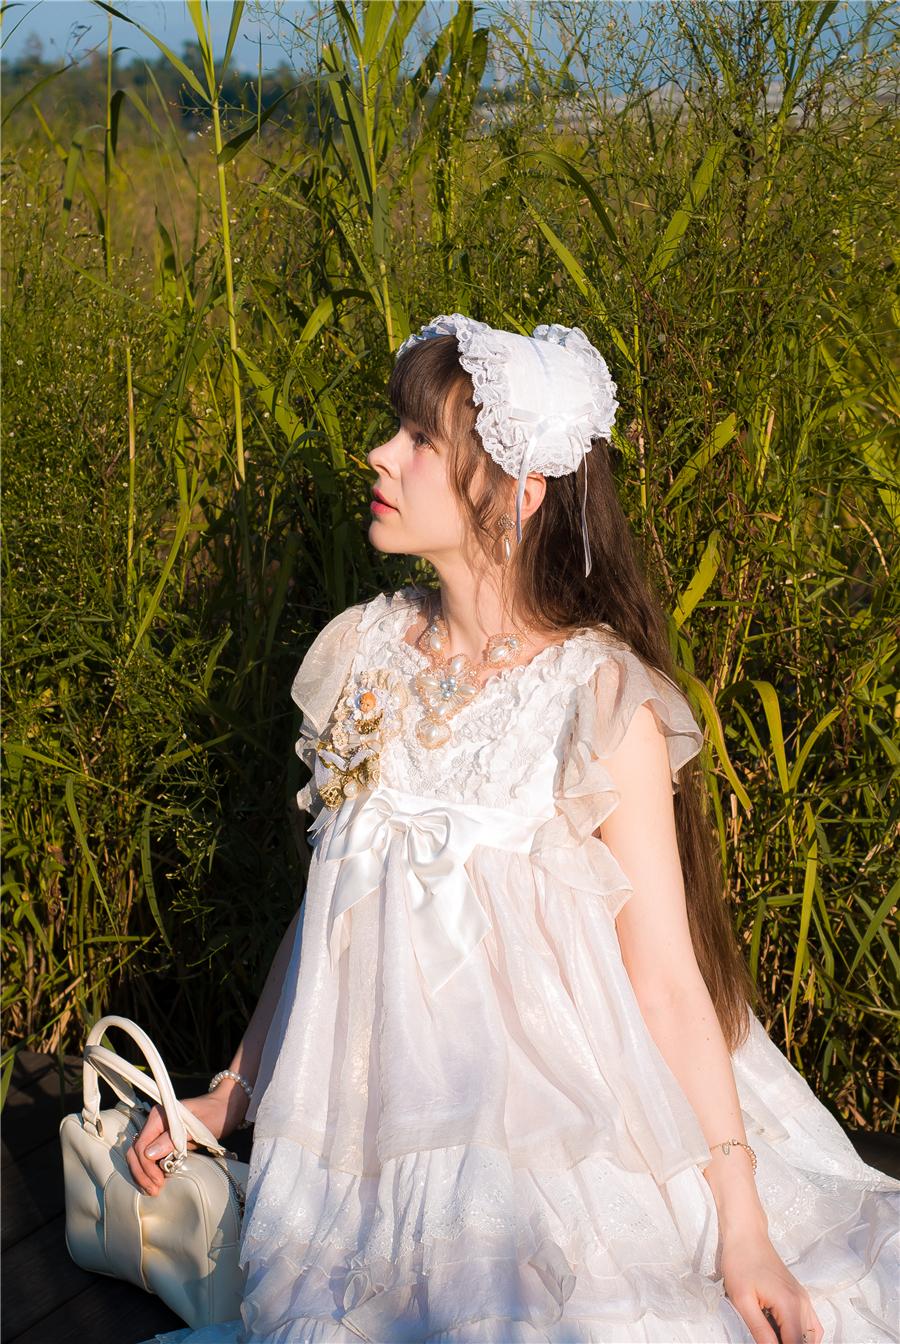 BabyPonytail_modelclaudia_Present Angel White JSK park04.jpg